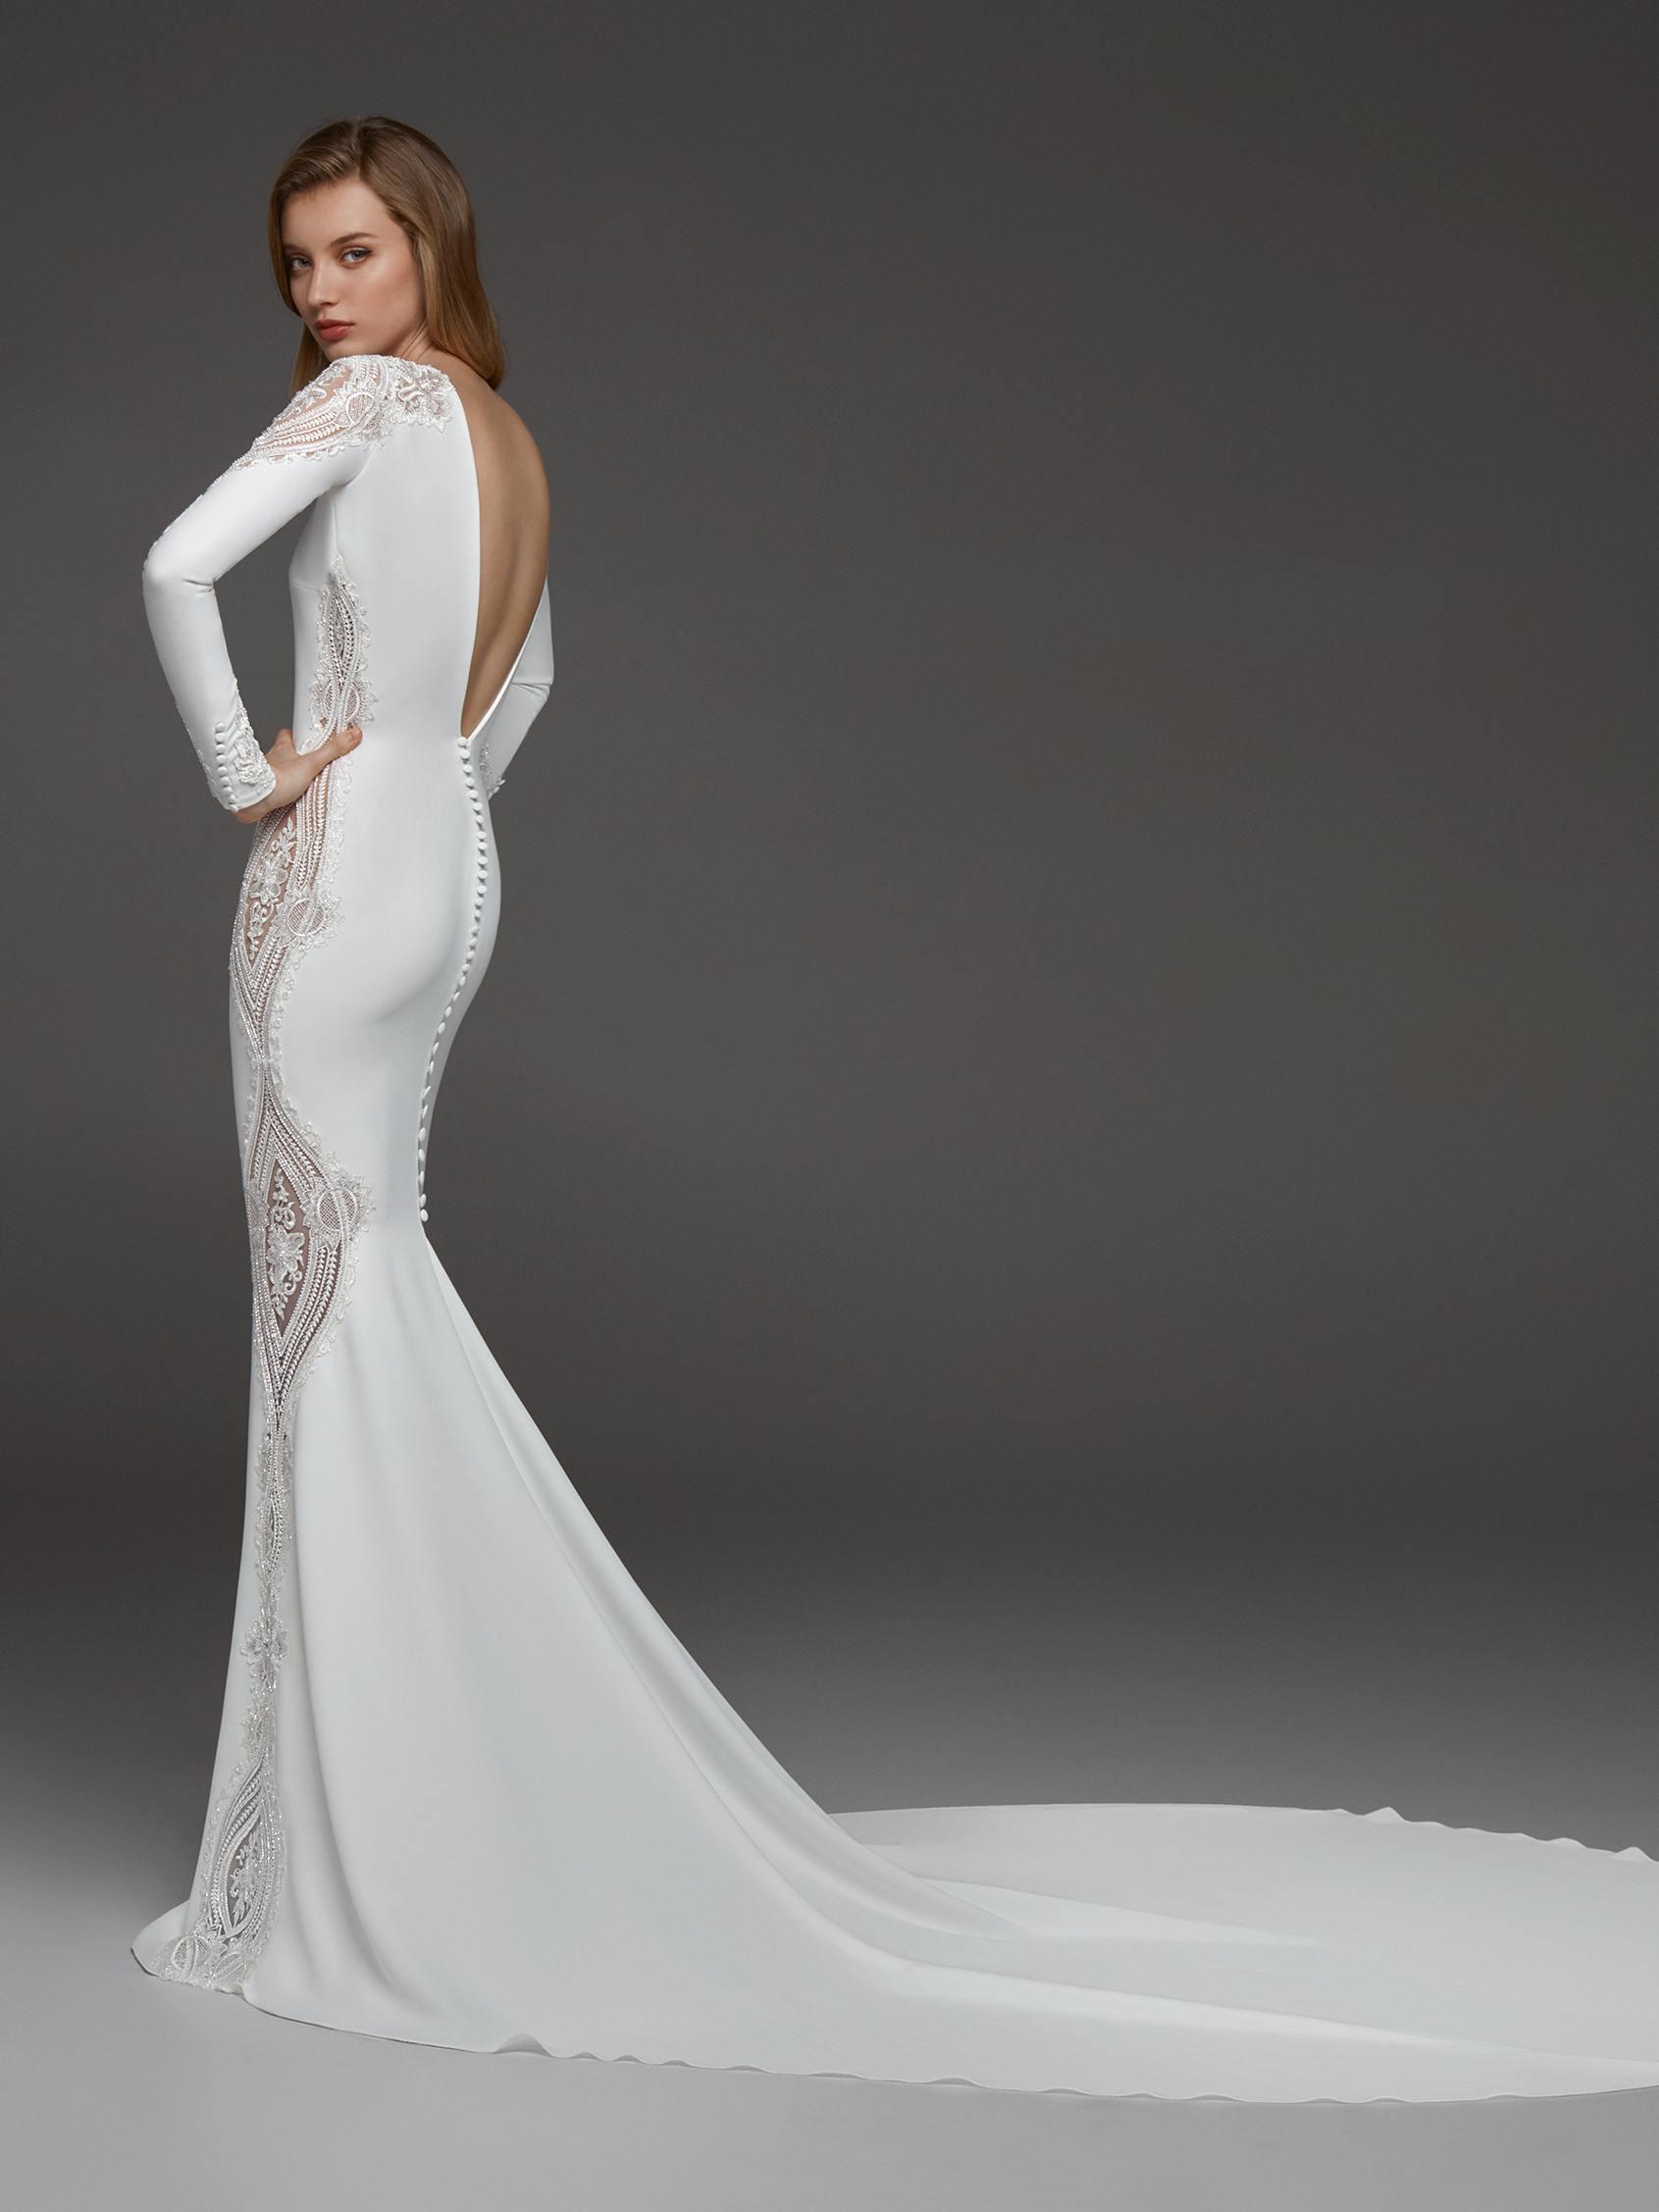 Long Sleeves Crepe Beaded Detailing Sheath Wedding Dress